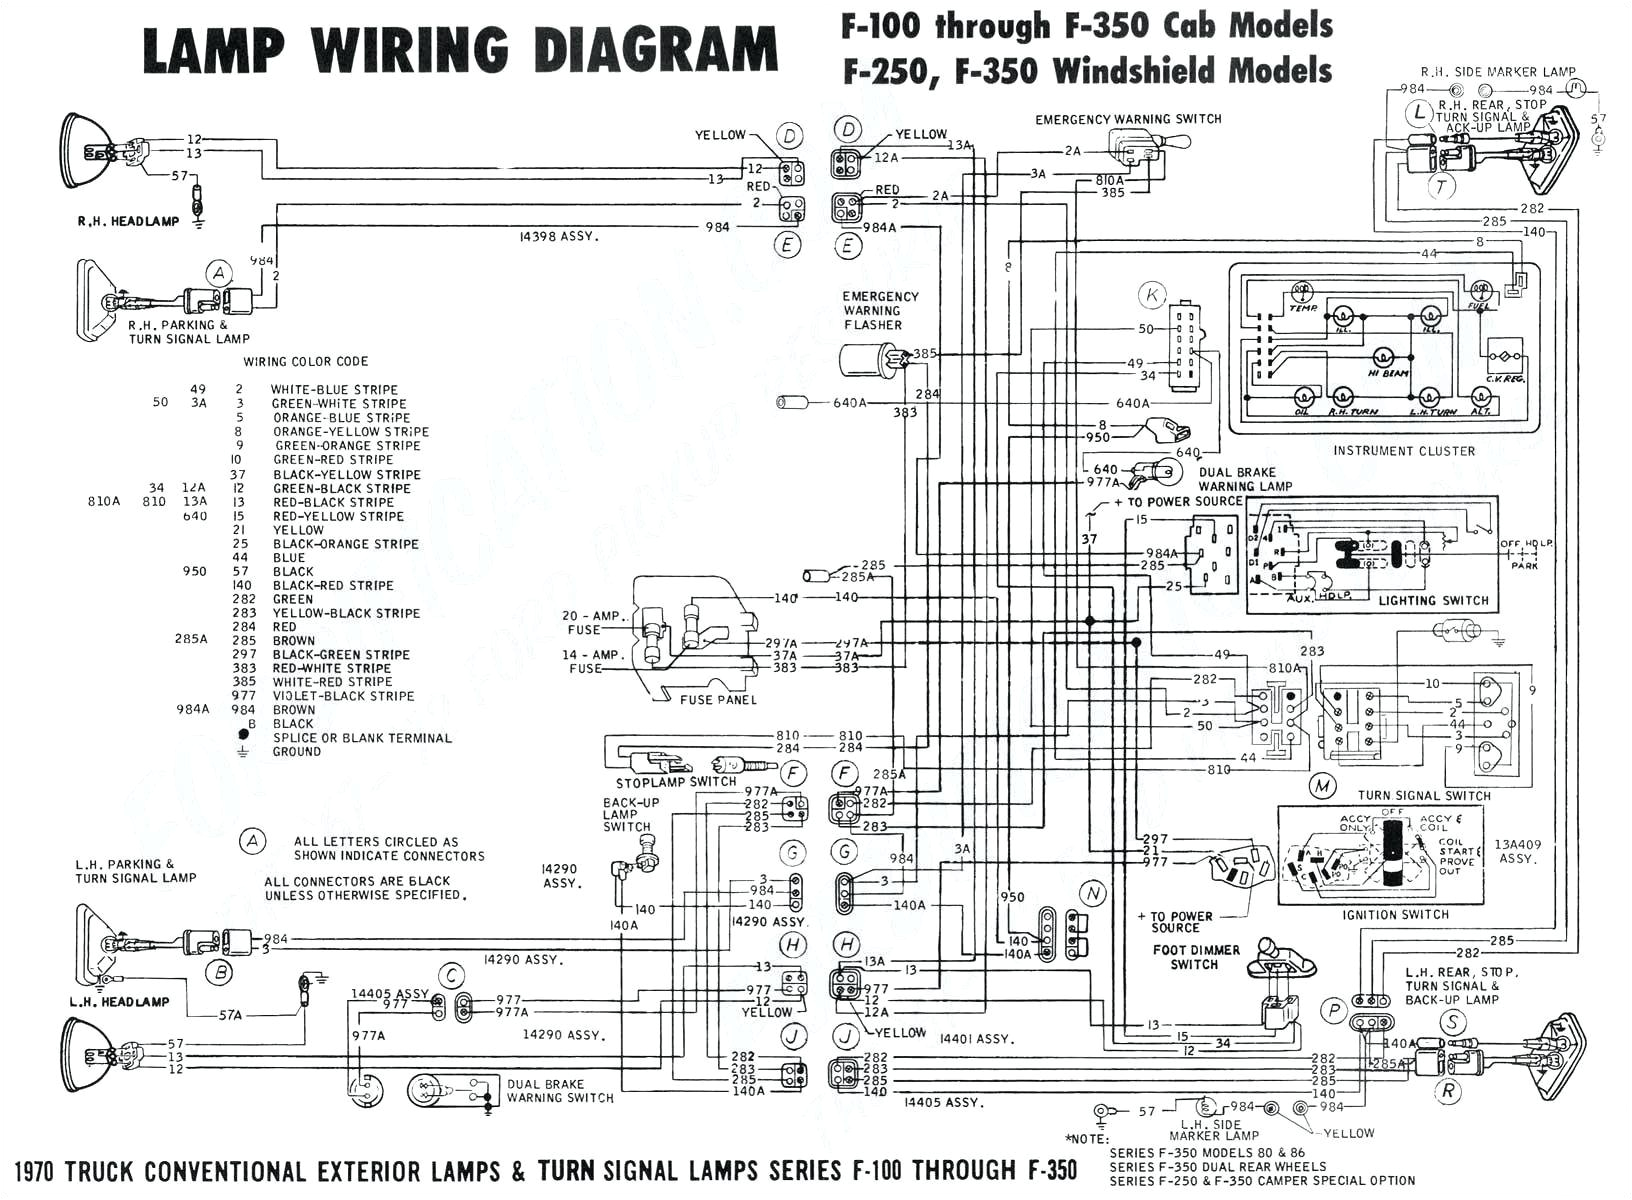 turn signal and brake light wiring diagram wiring diagram database 900 universal turn signal switch schematic free download wiring